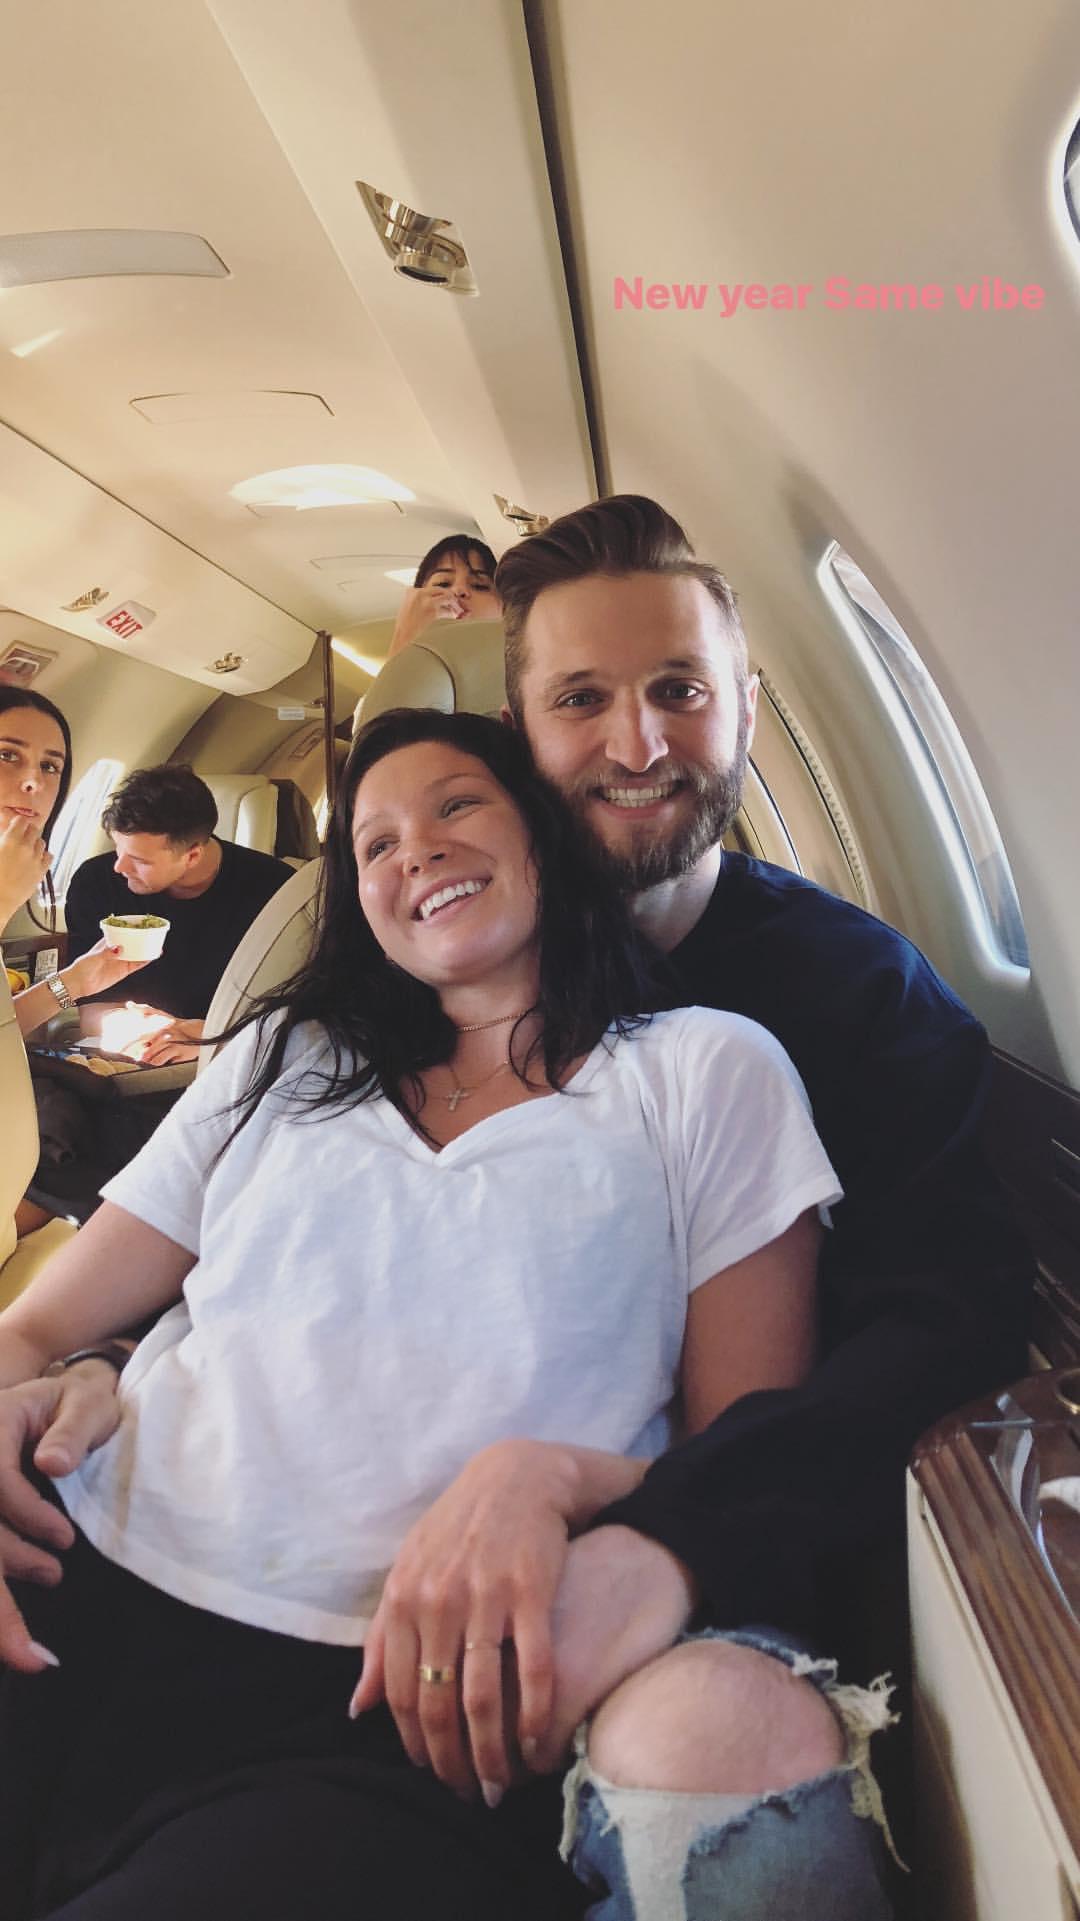 selena gomez friends plane